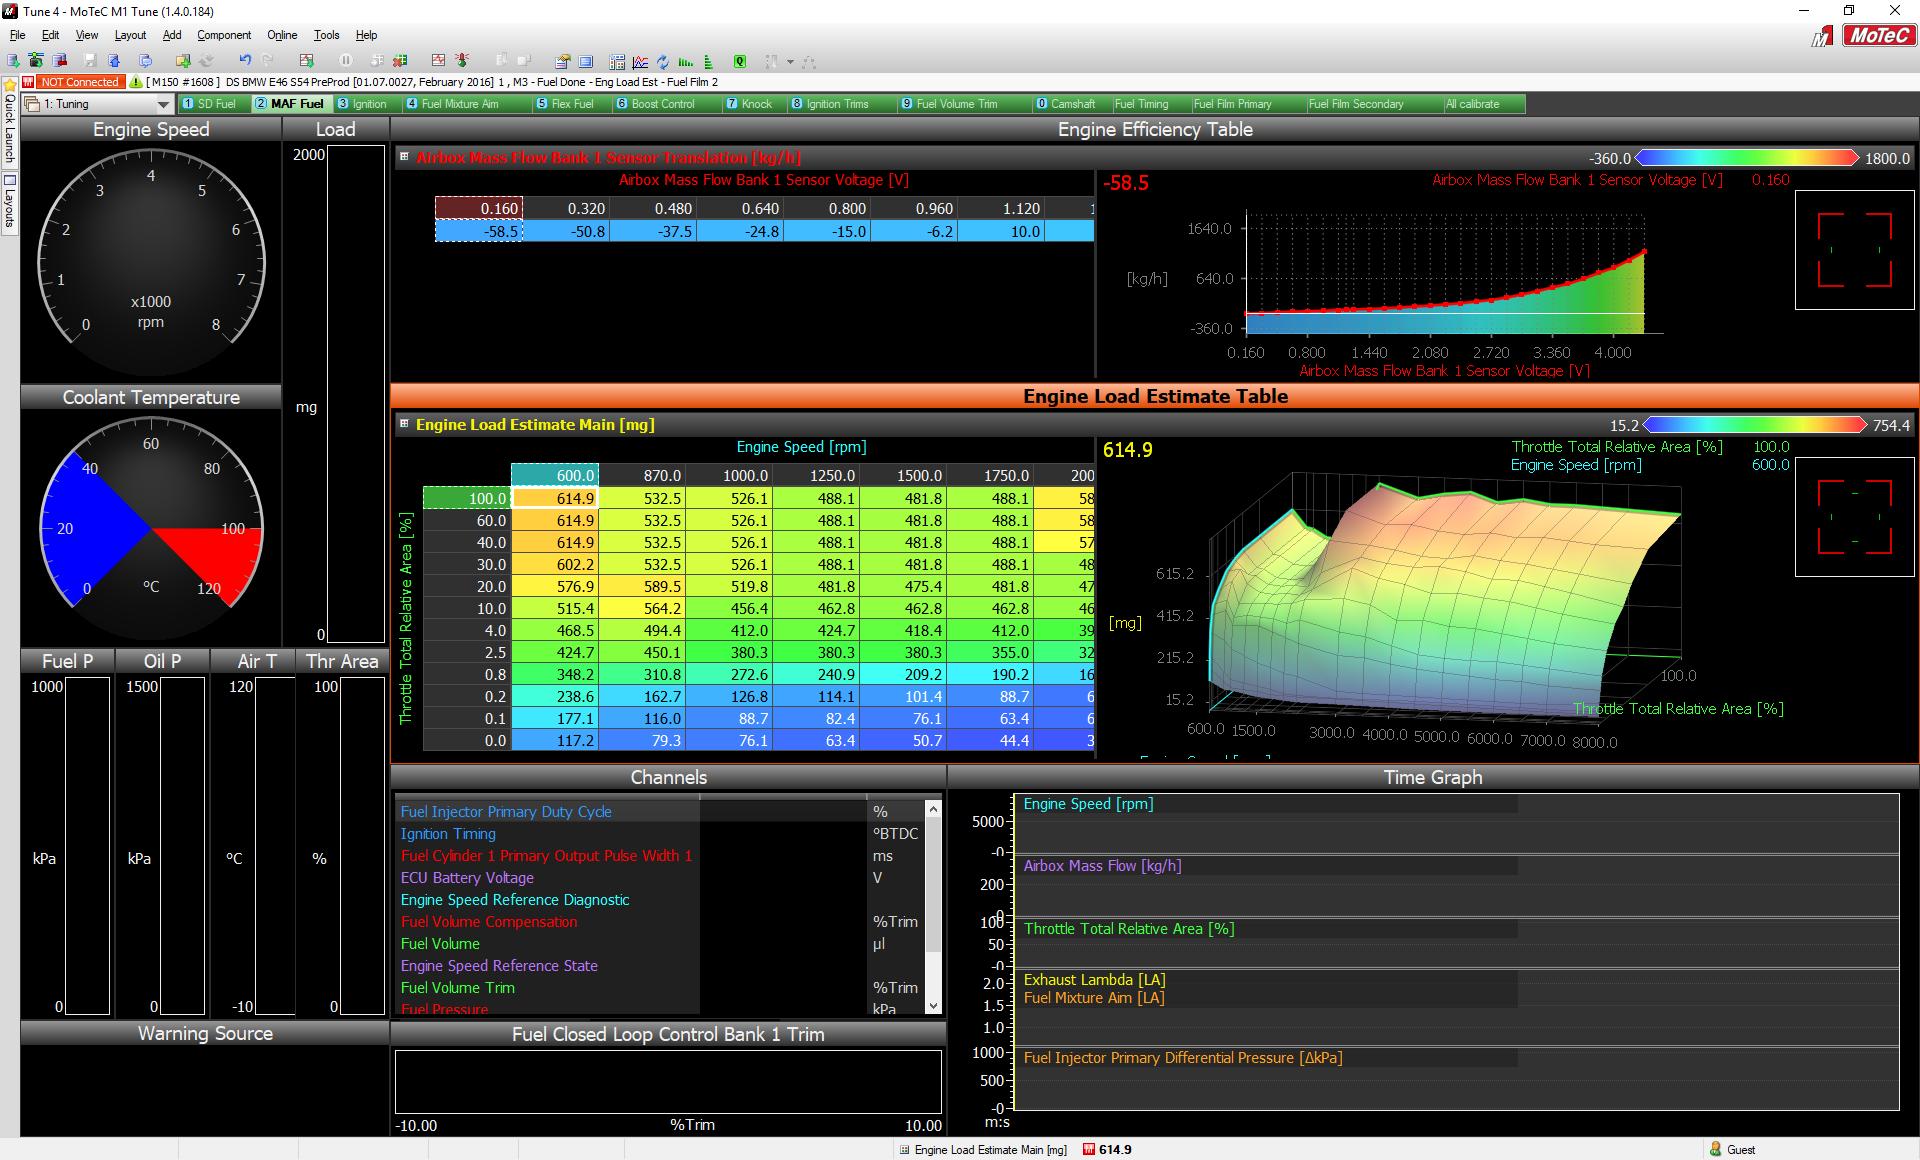 Drobnak Software Blog Pro Efi Wiring Diagram Maf Fuel